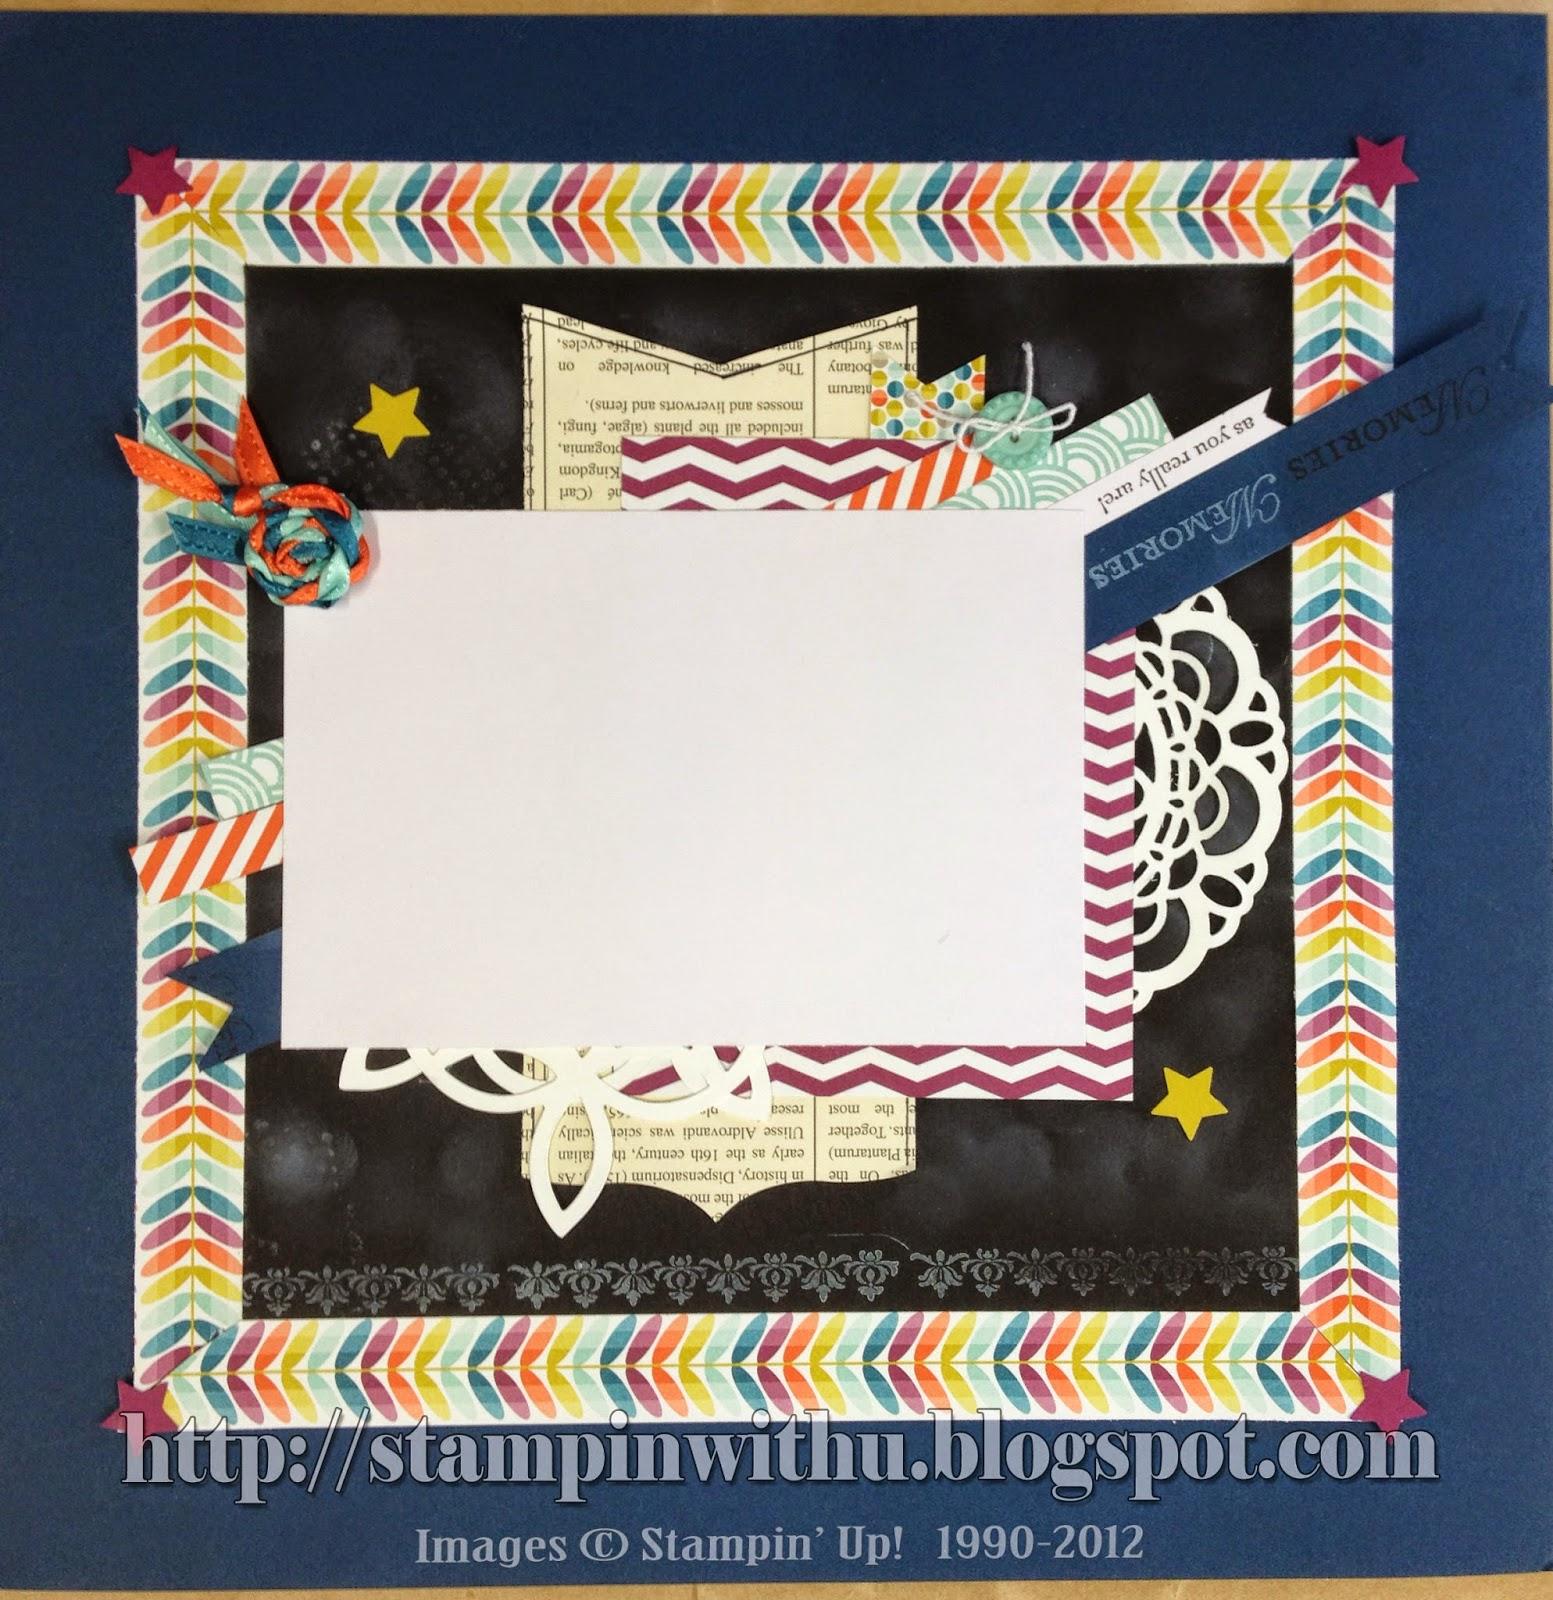 12x12 Scrapbook Page - Chalkboard Technique